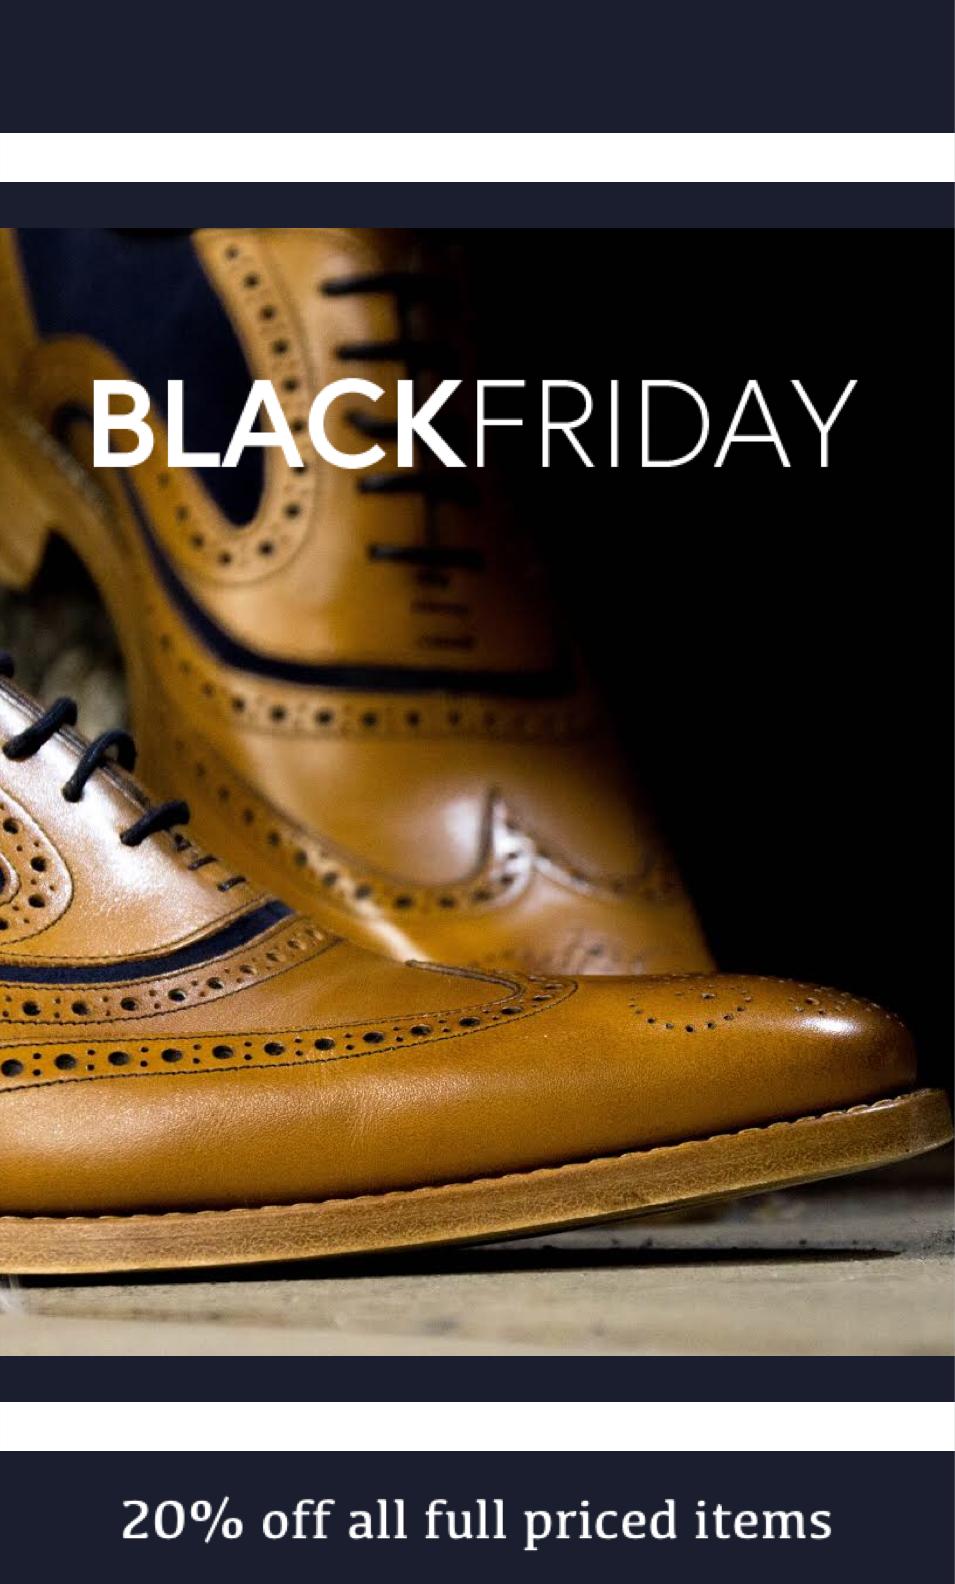 British Shoe Company: Black Friday SALE